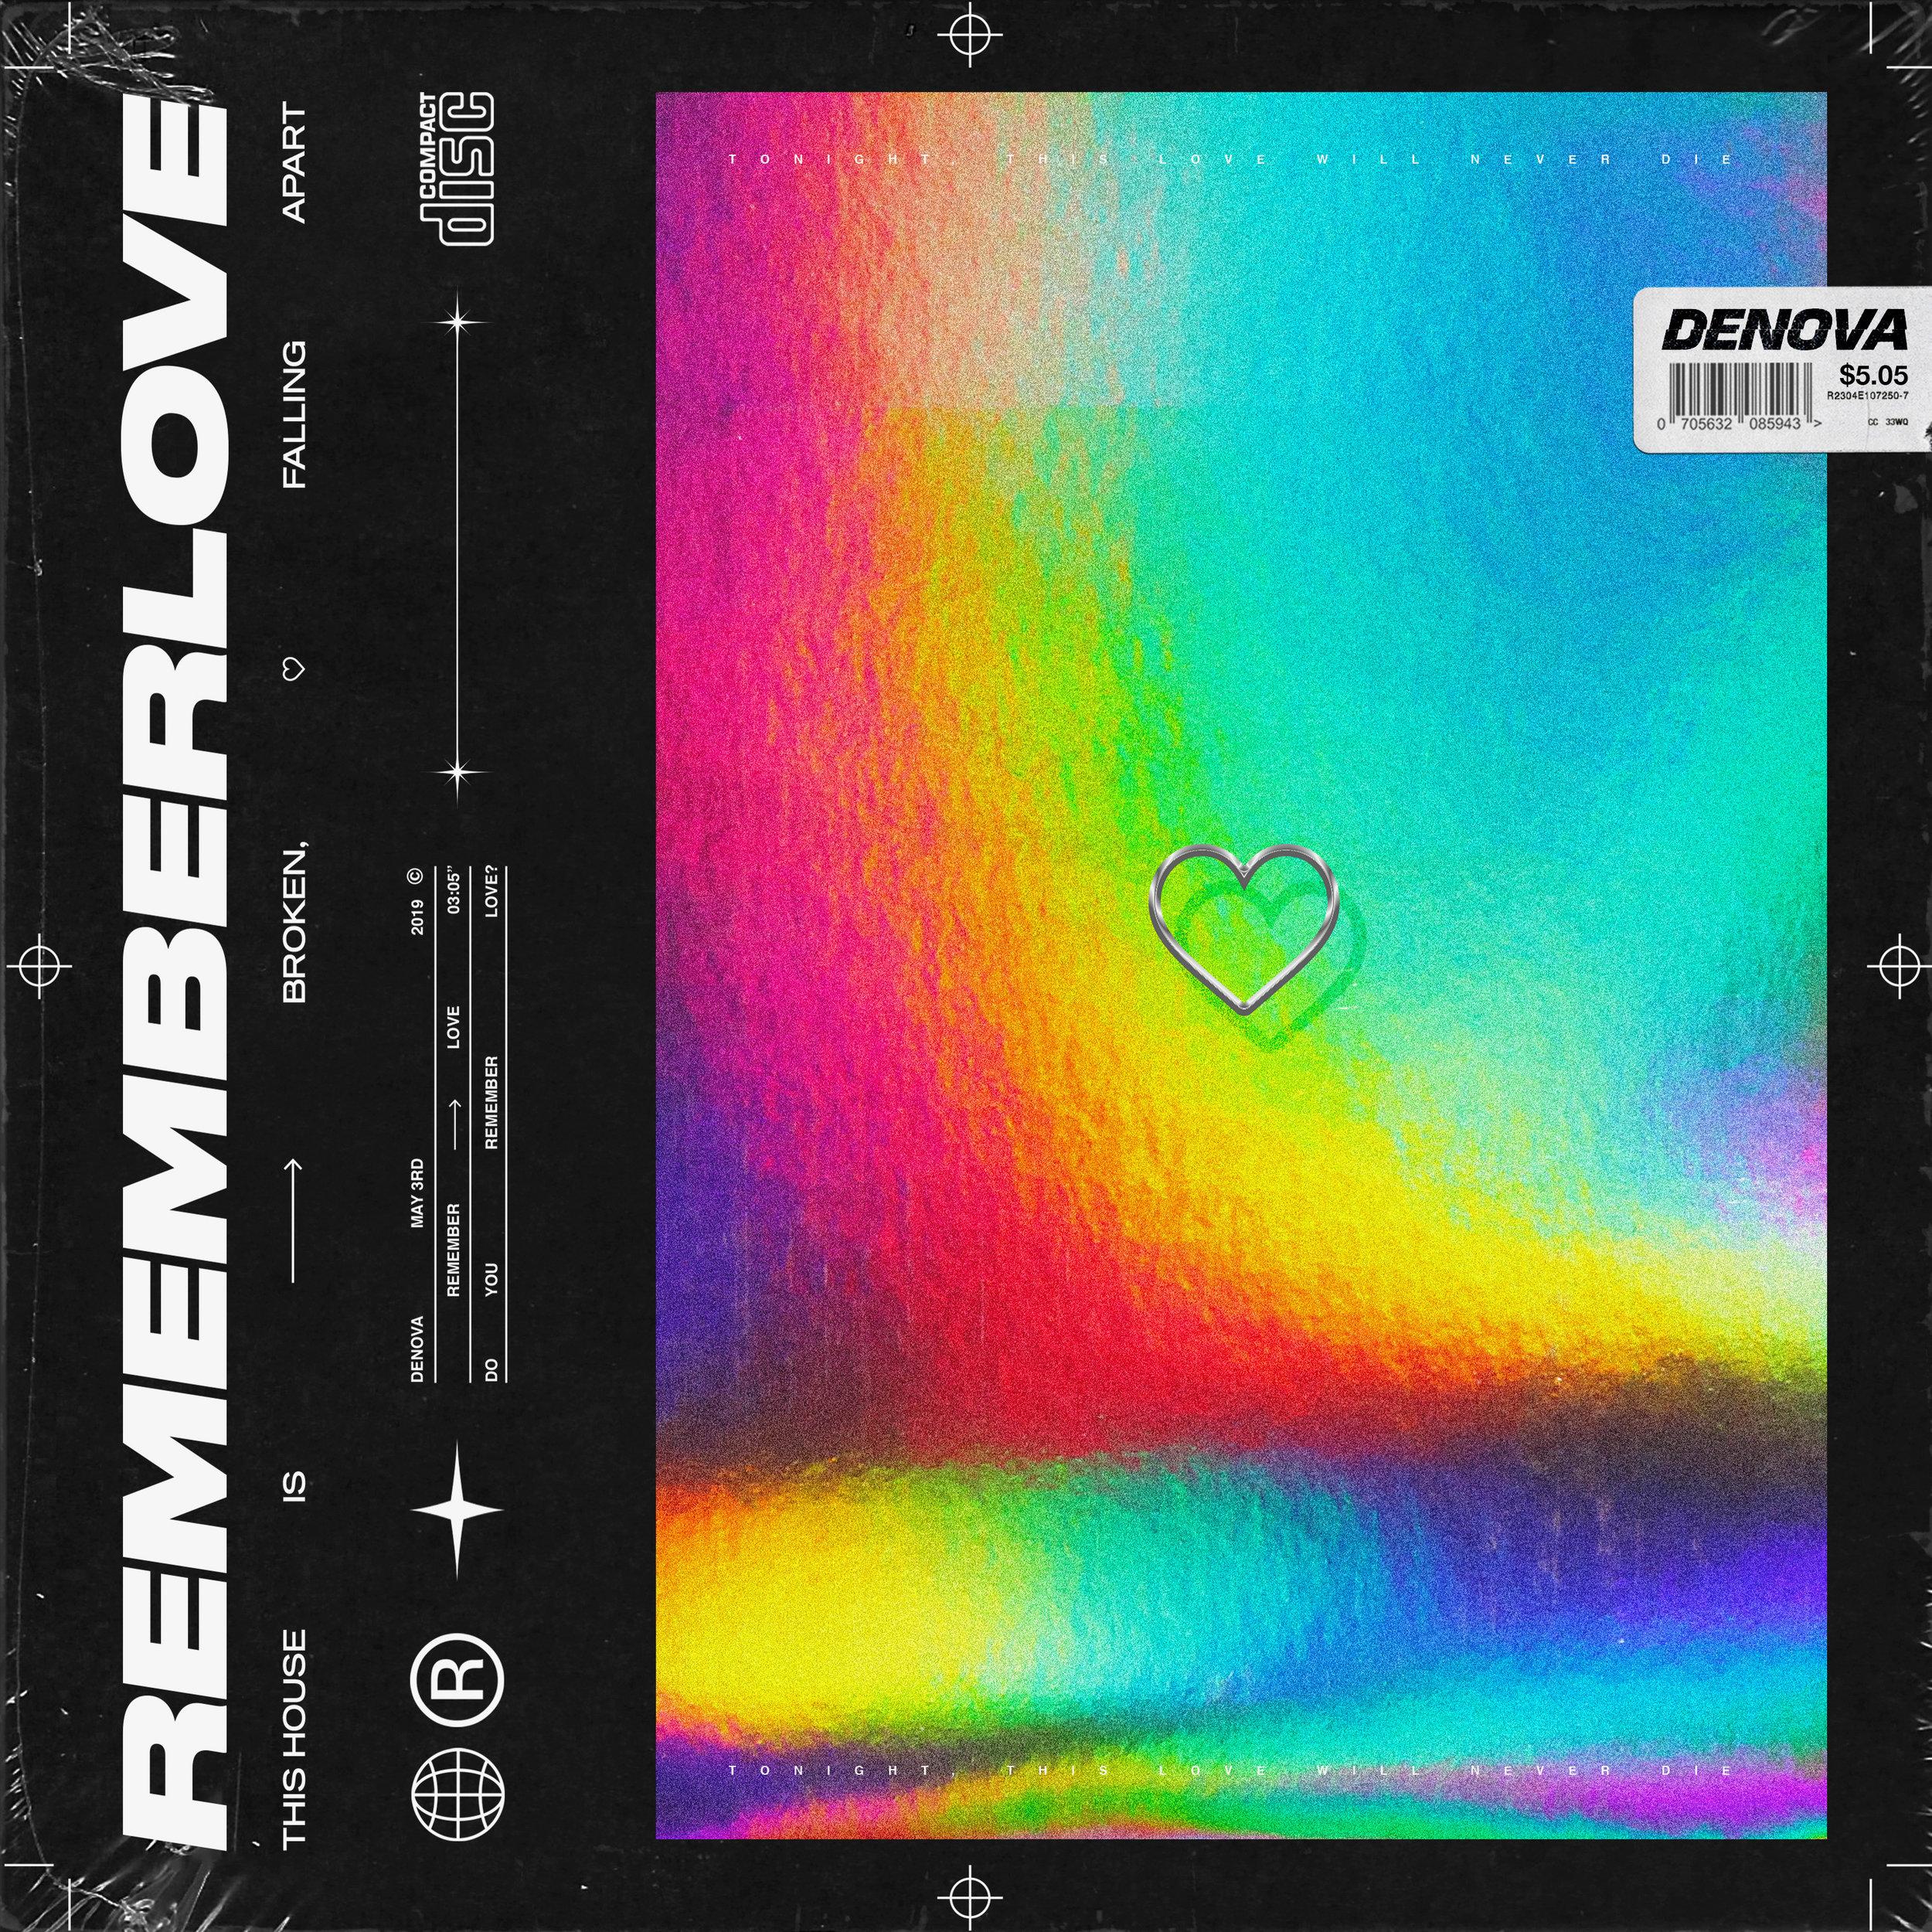 denova-RL-cover.jpeg